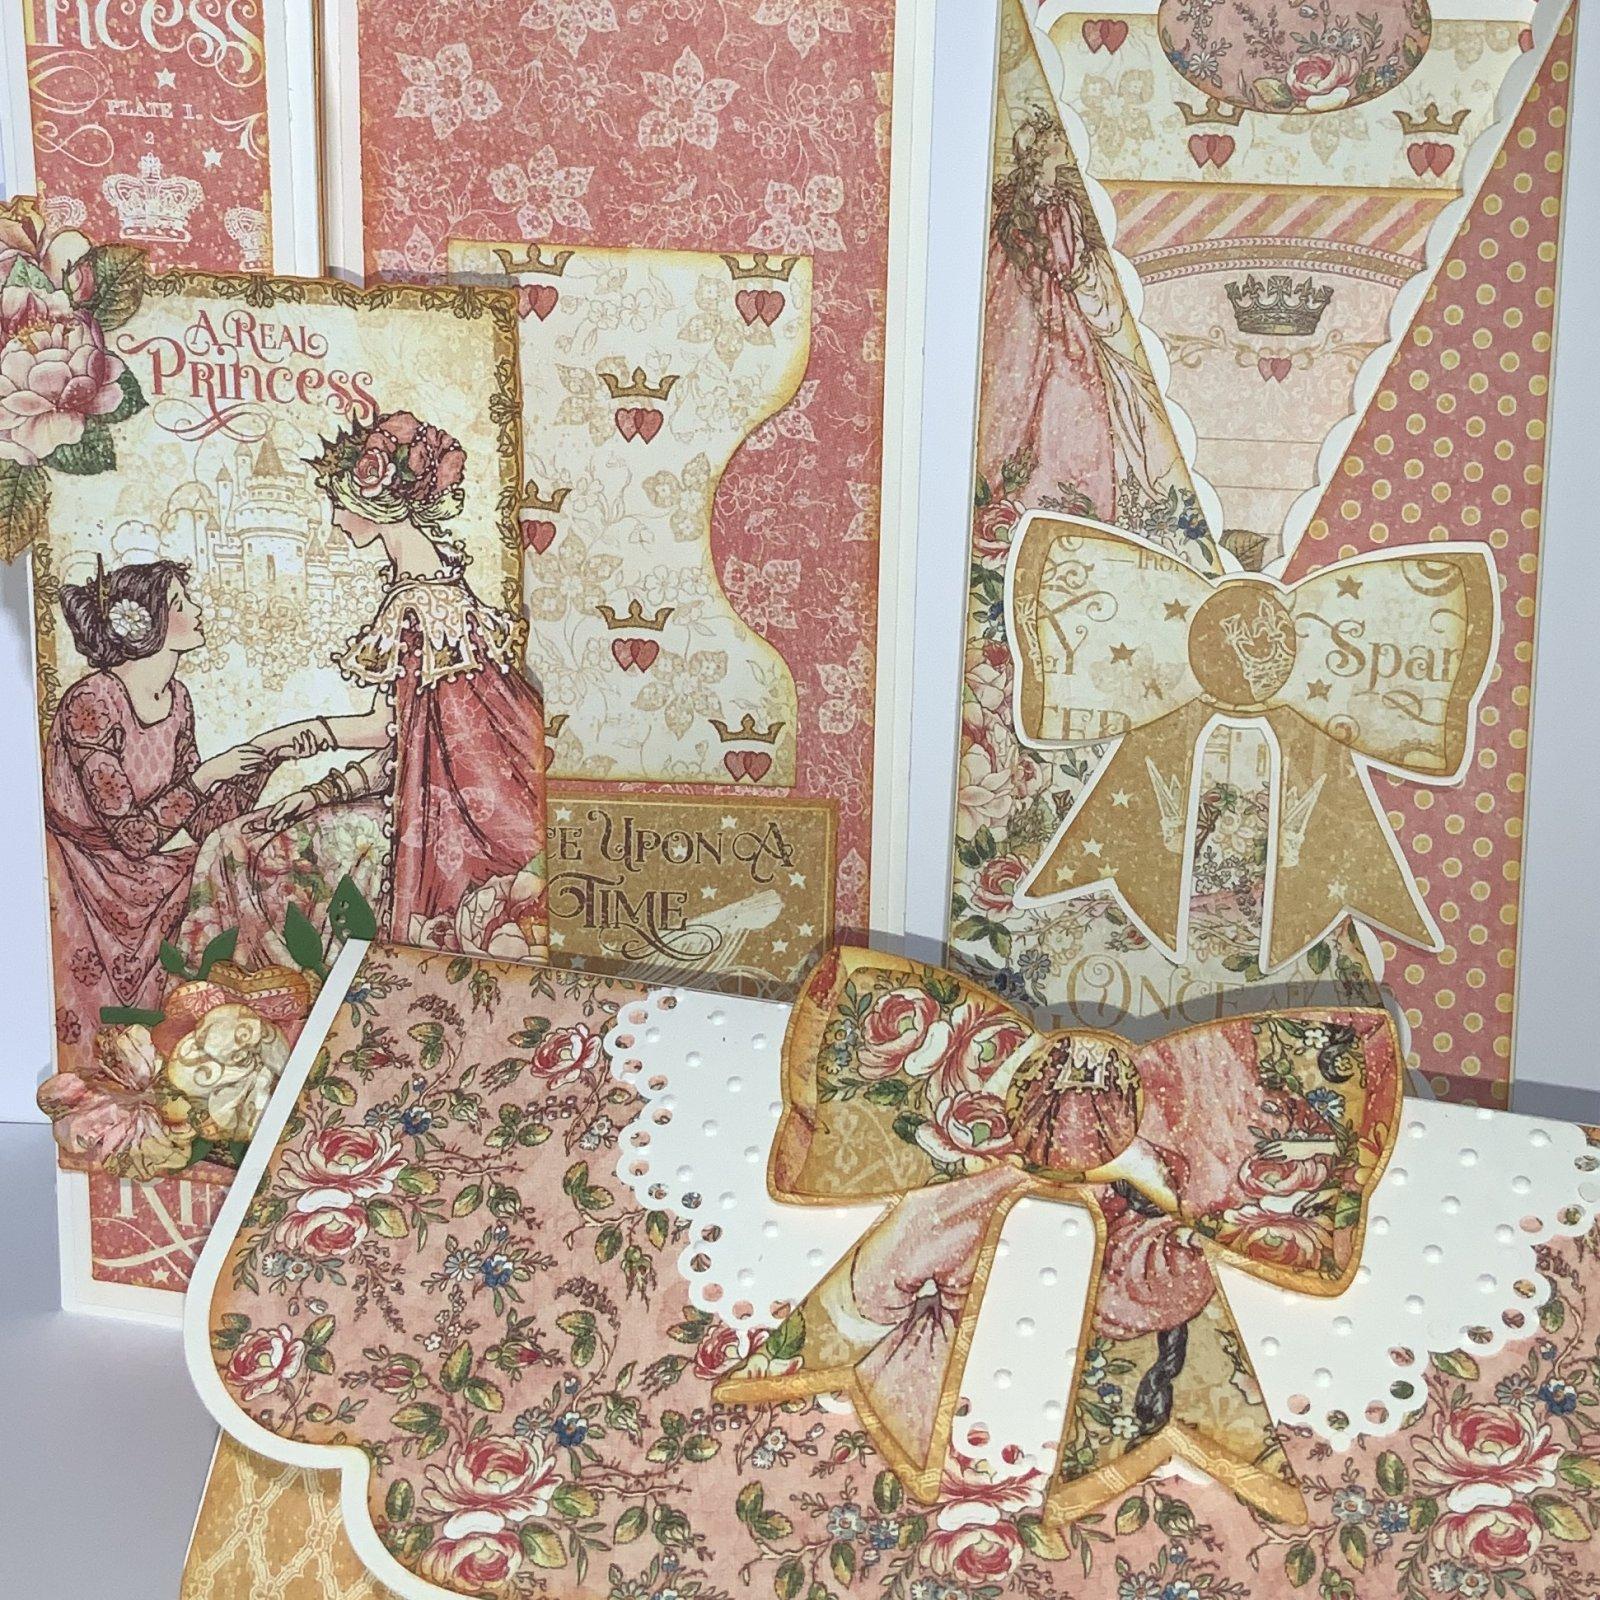 3 Card Kit - Slimline Graphic 45 Princess Set II